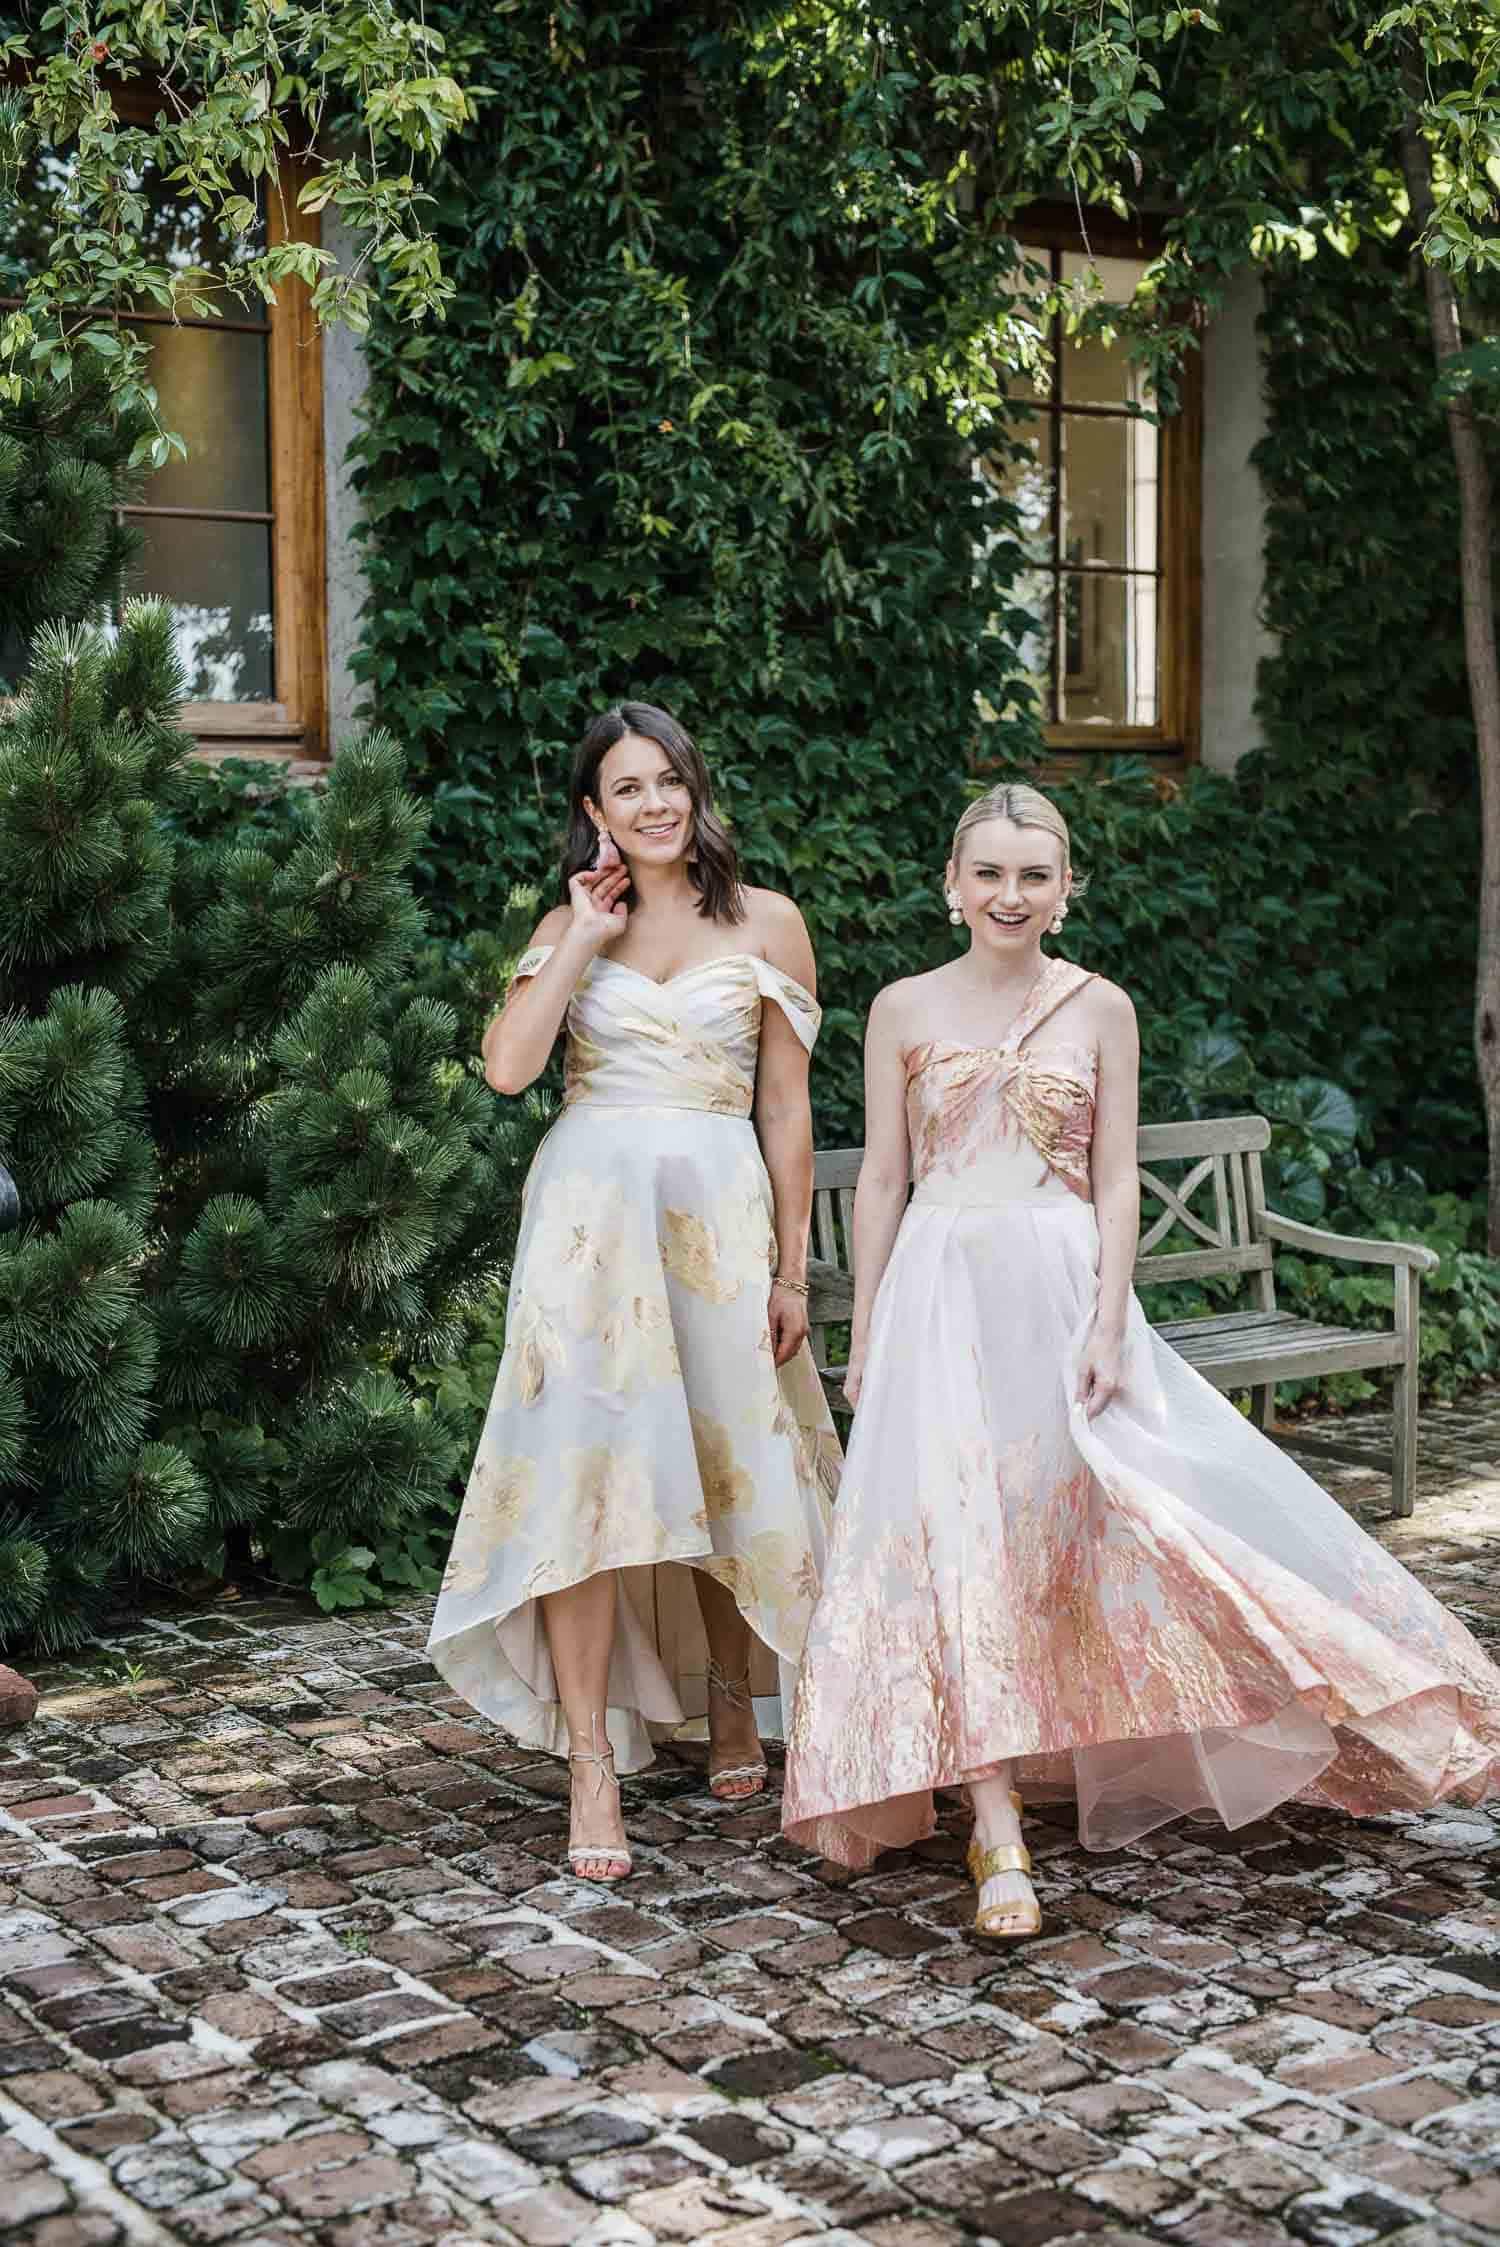 Formal Beach Wedding outfit ideas